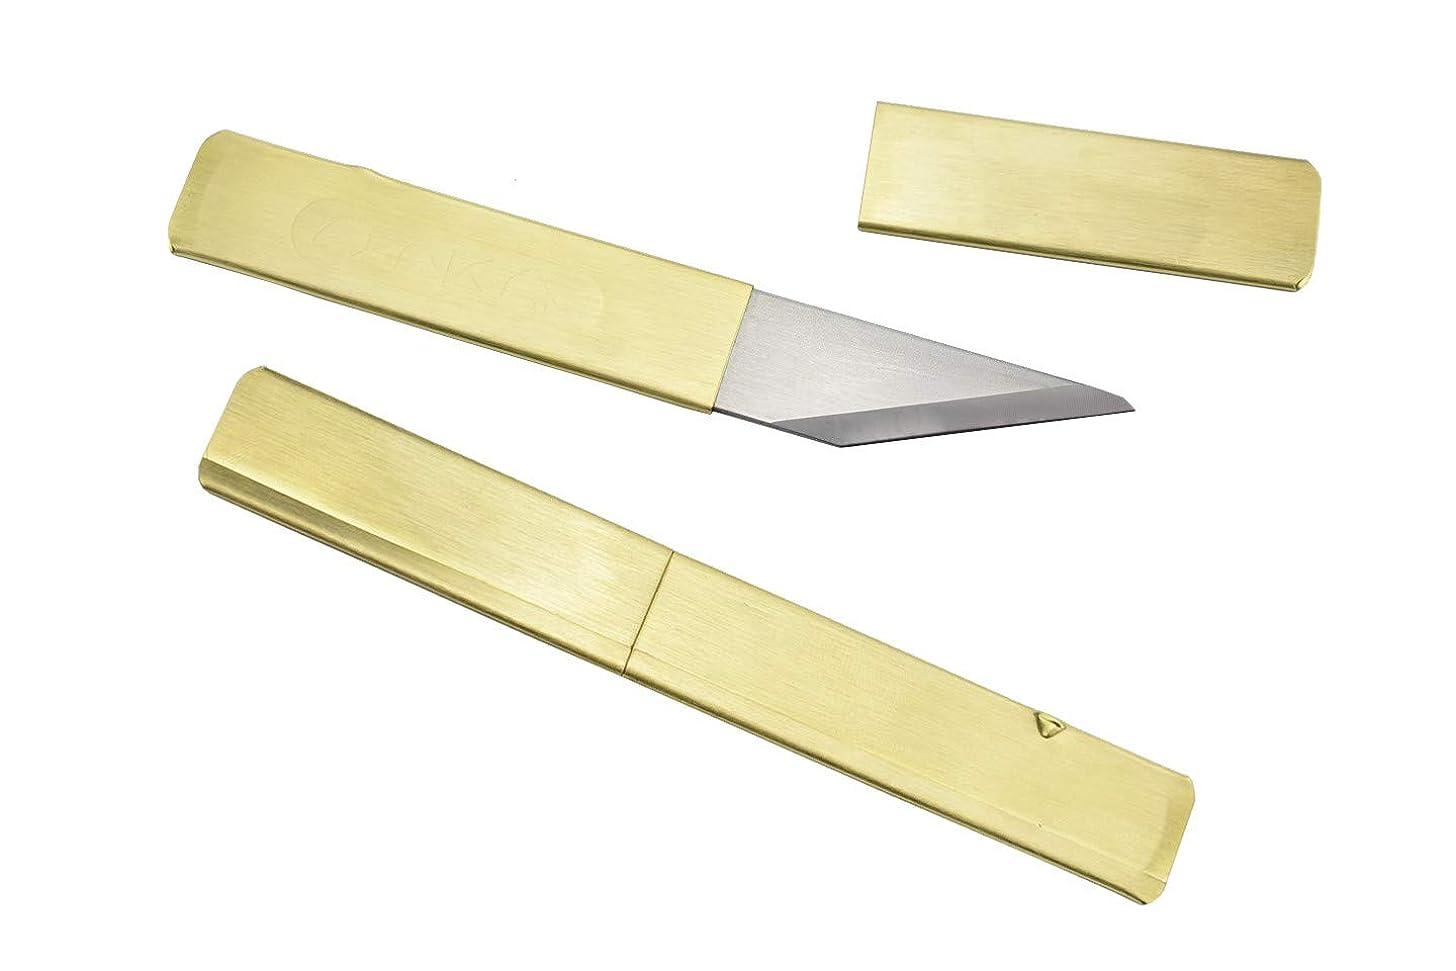 Right Hand/Wood Carving Japanese Kiridashi Knife/Brass (Japan Import)